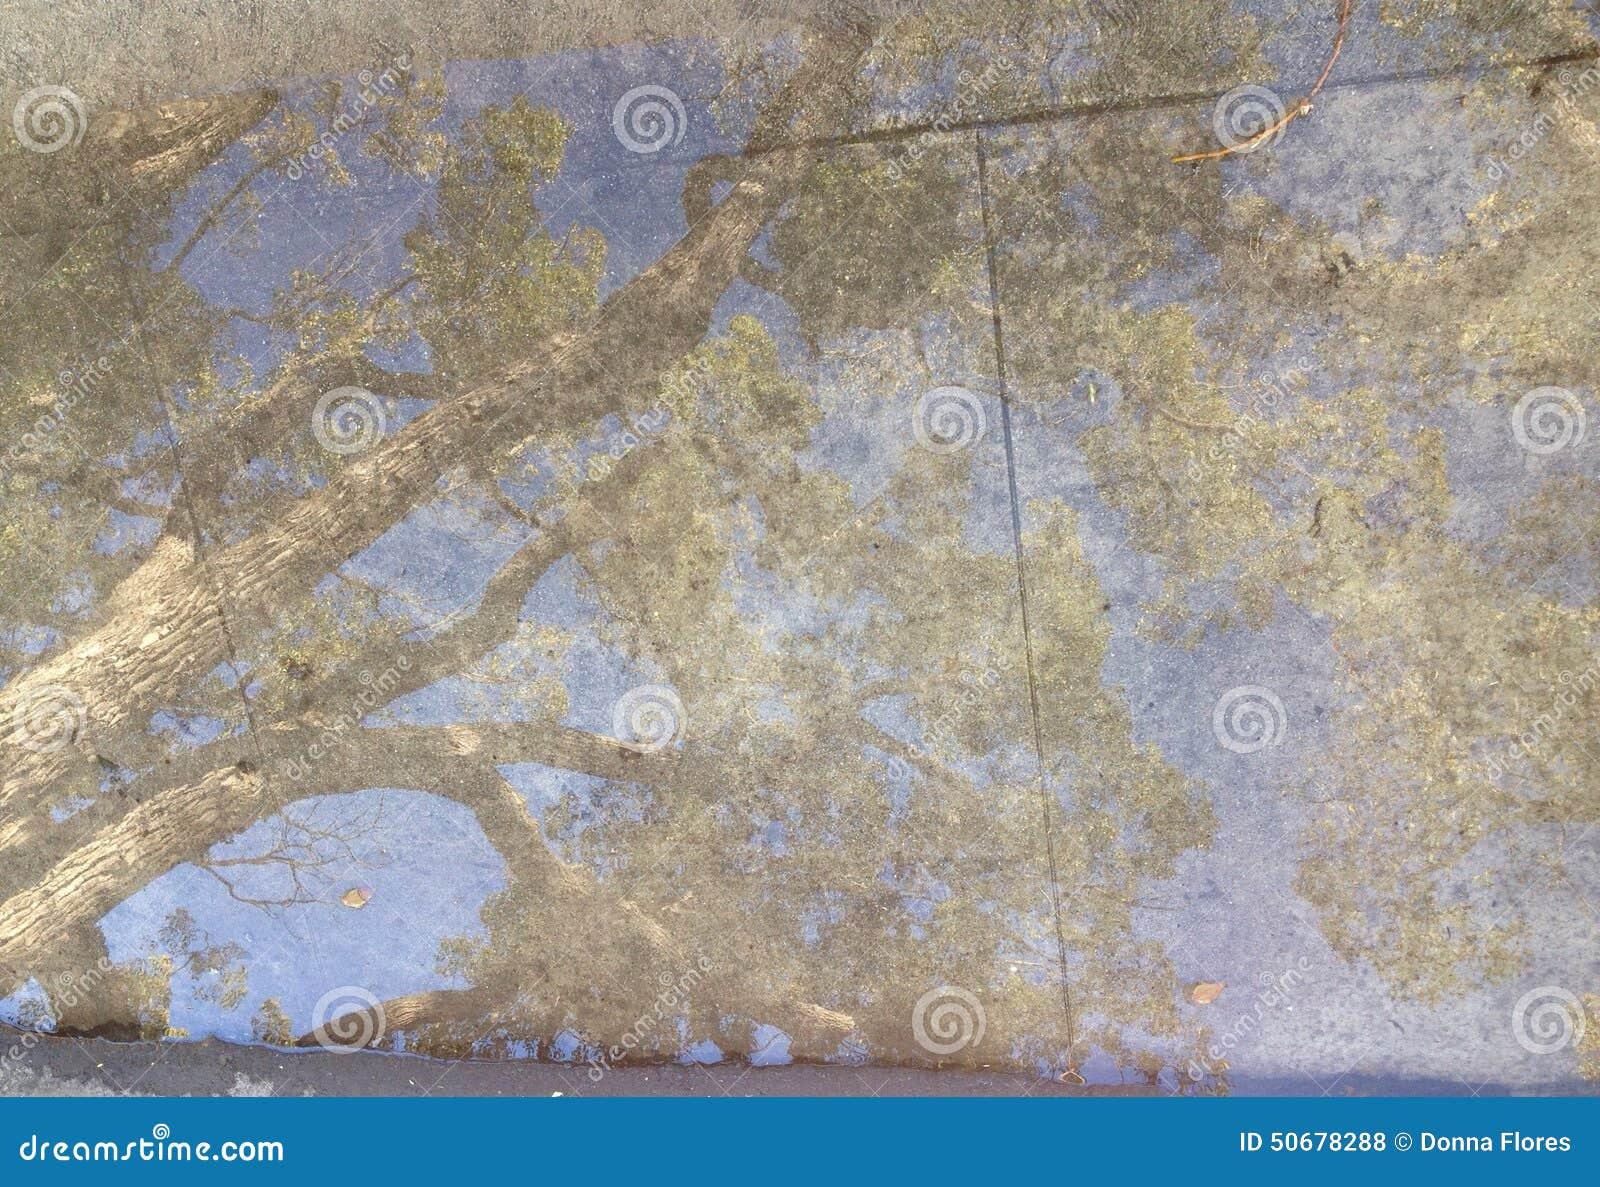 Download 雨水坑反射树 库存照片. 图片 包括有 结构树, browne, 绿色, 镇压, 反射, 边路, 反映, 大麦 - 50678288